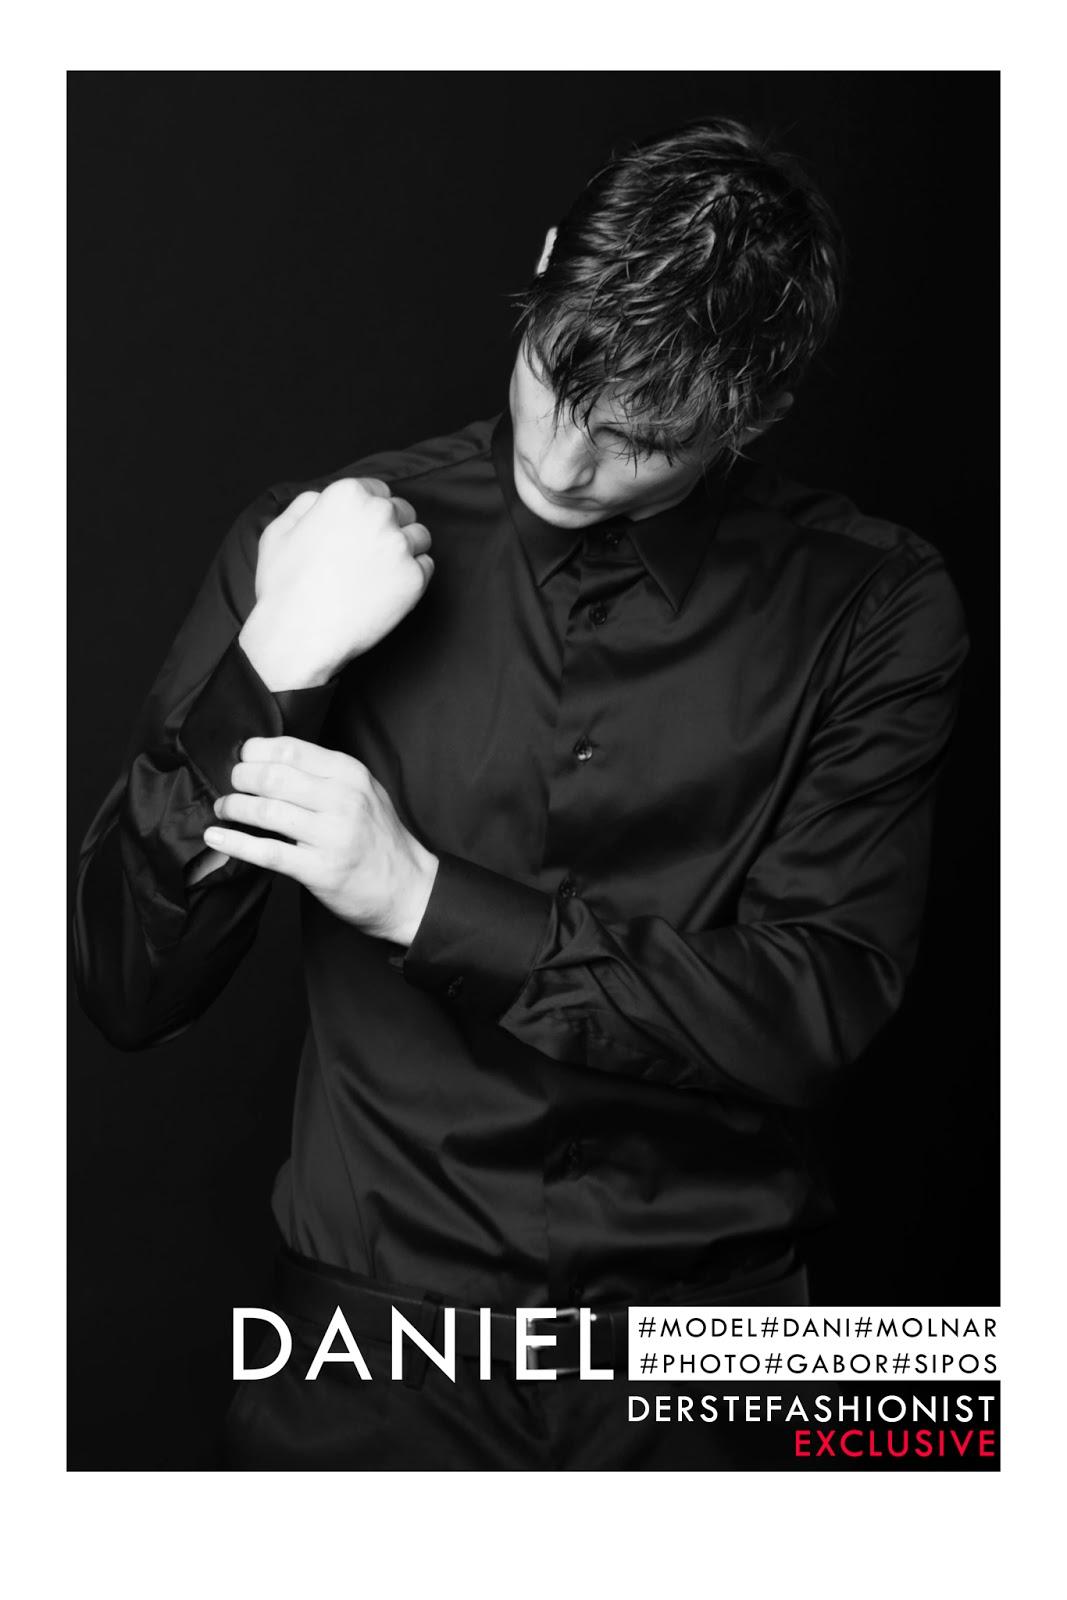 Der Stefashionist Fashion Passion Models Marc Schulze: Der Stefashionist: Fashion, Passion & Models: November 2013